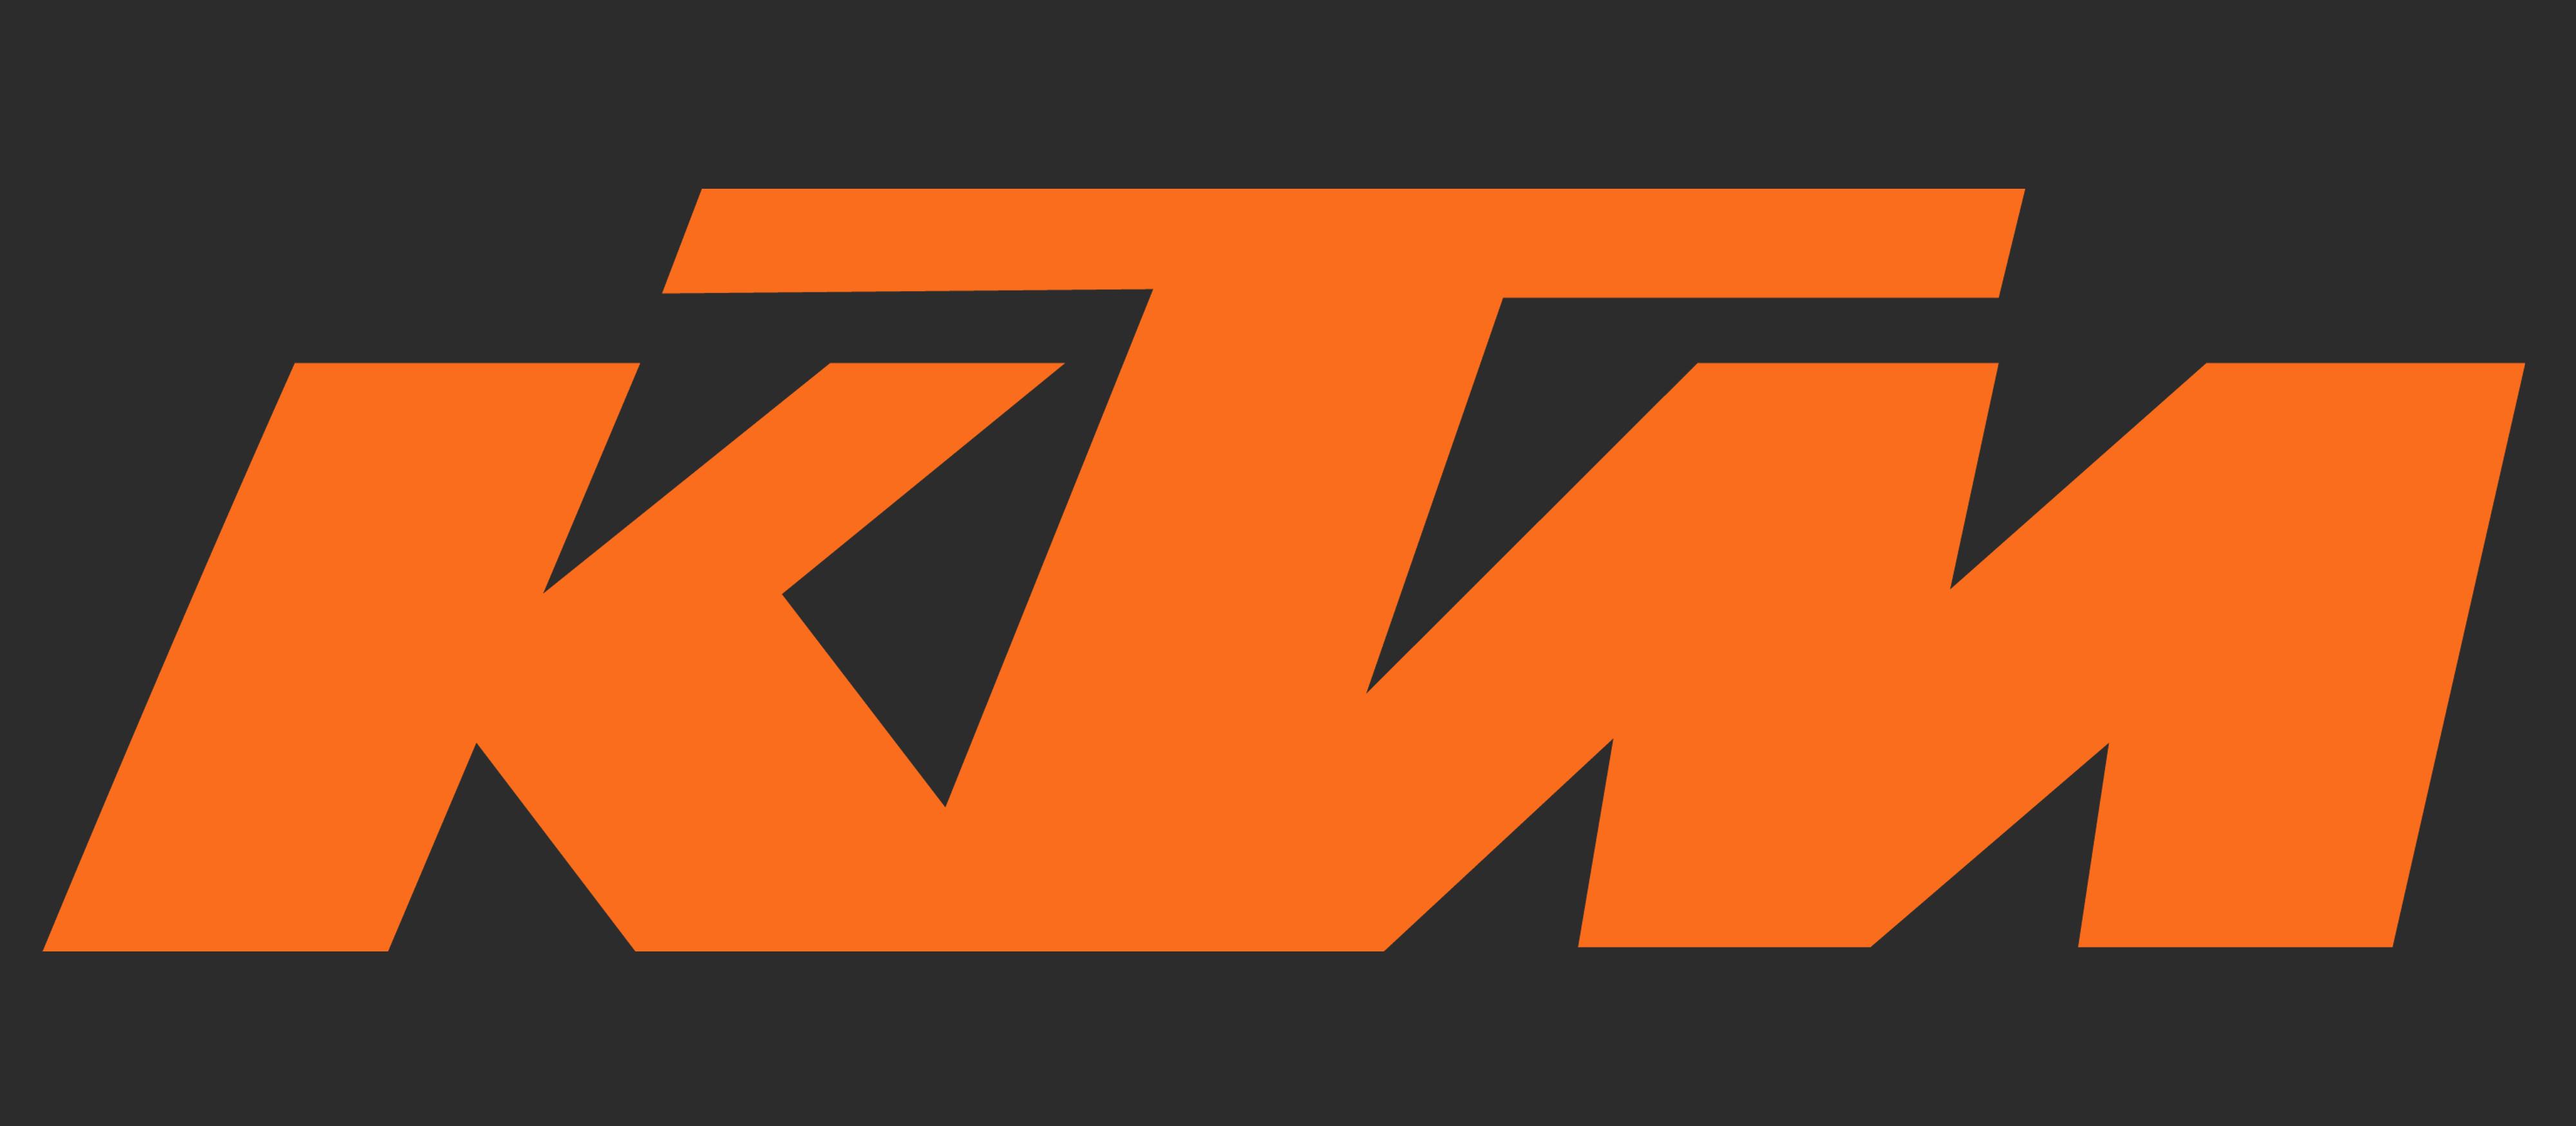 КТМ-logo